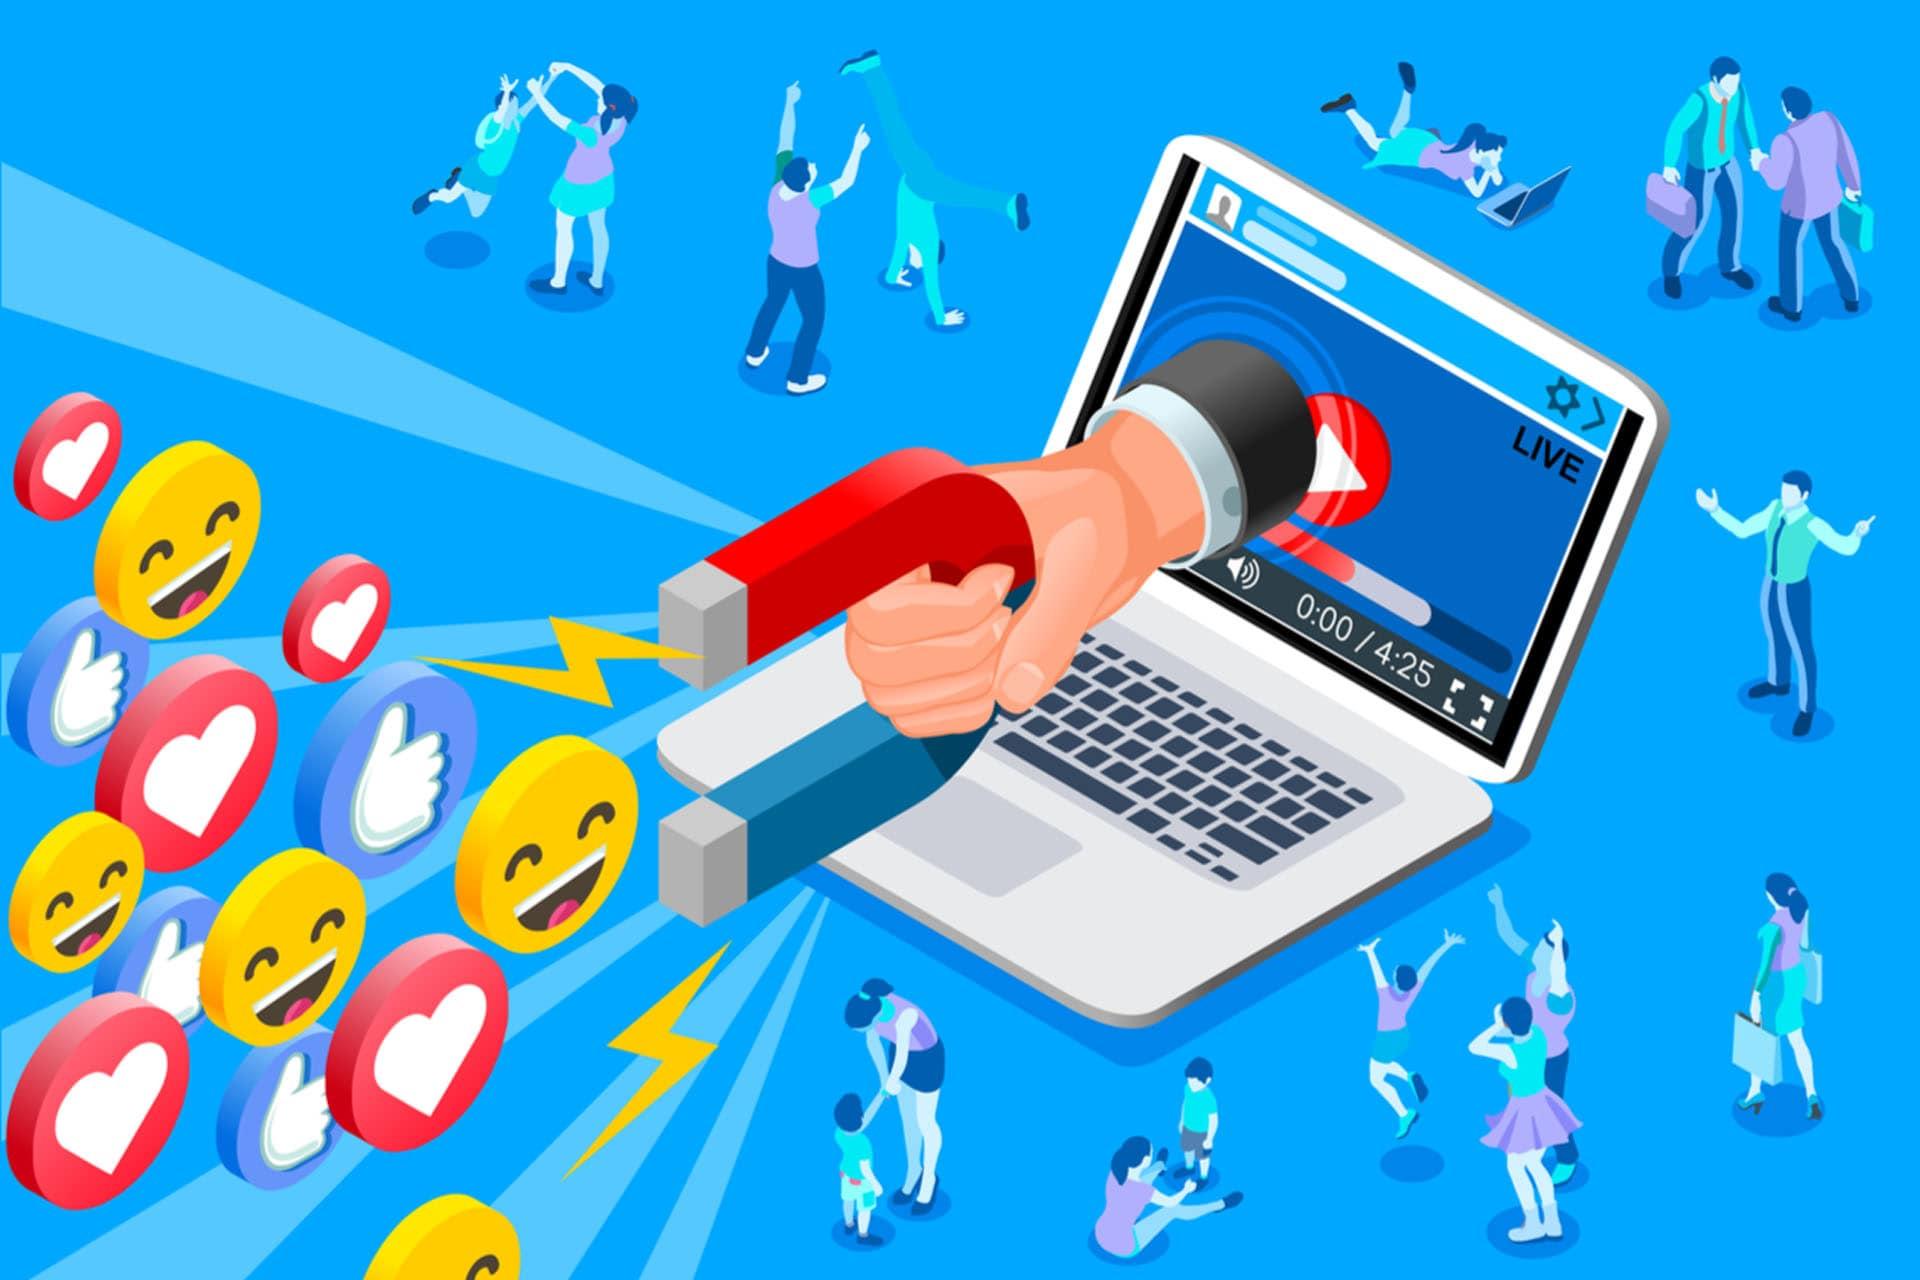 Socialmediamarketingblog